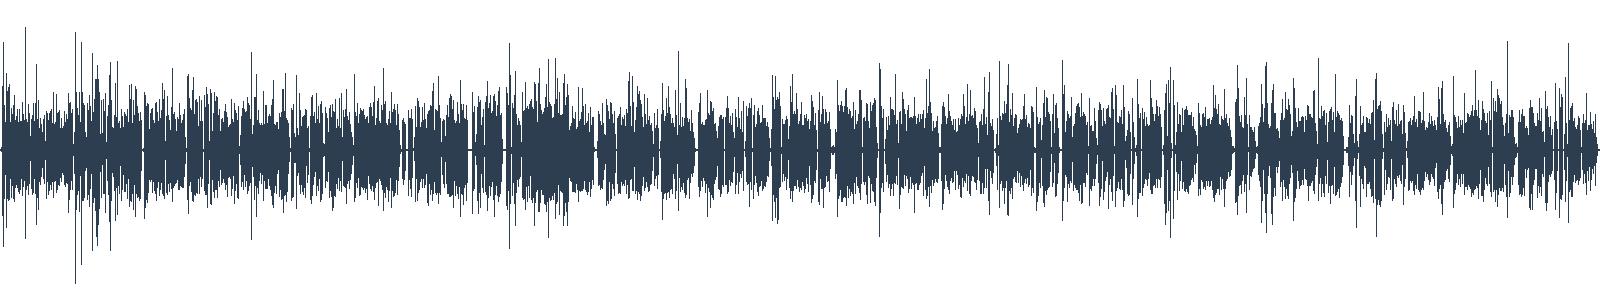 Muflón Ancijáš a mimozemšťania waveform